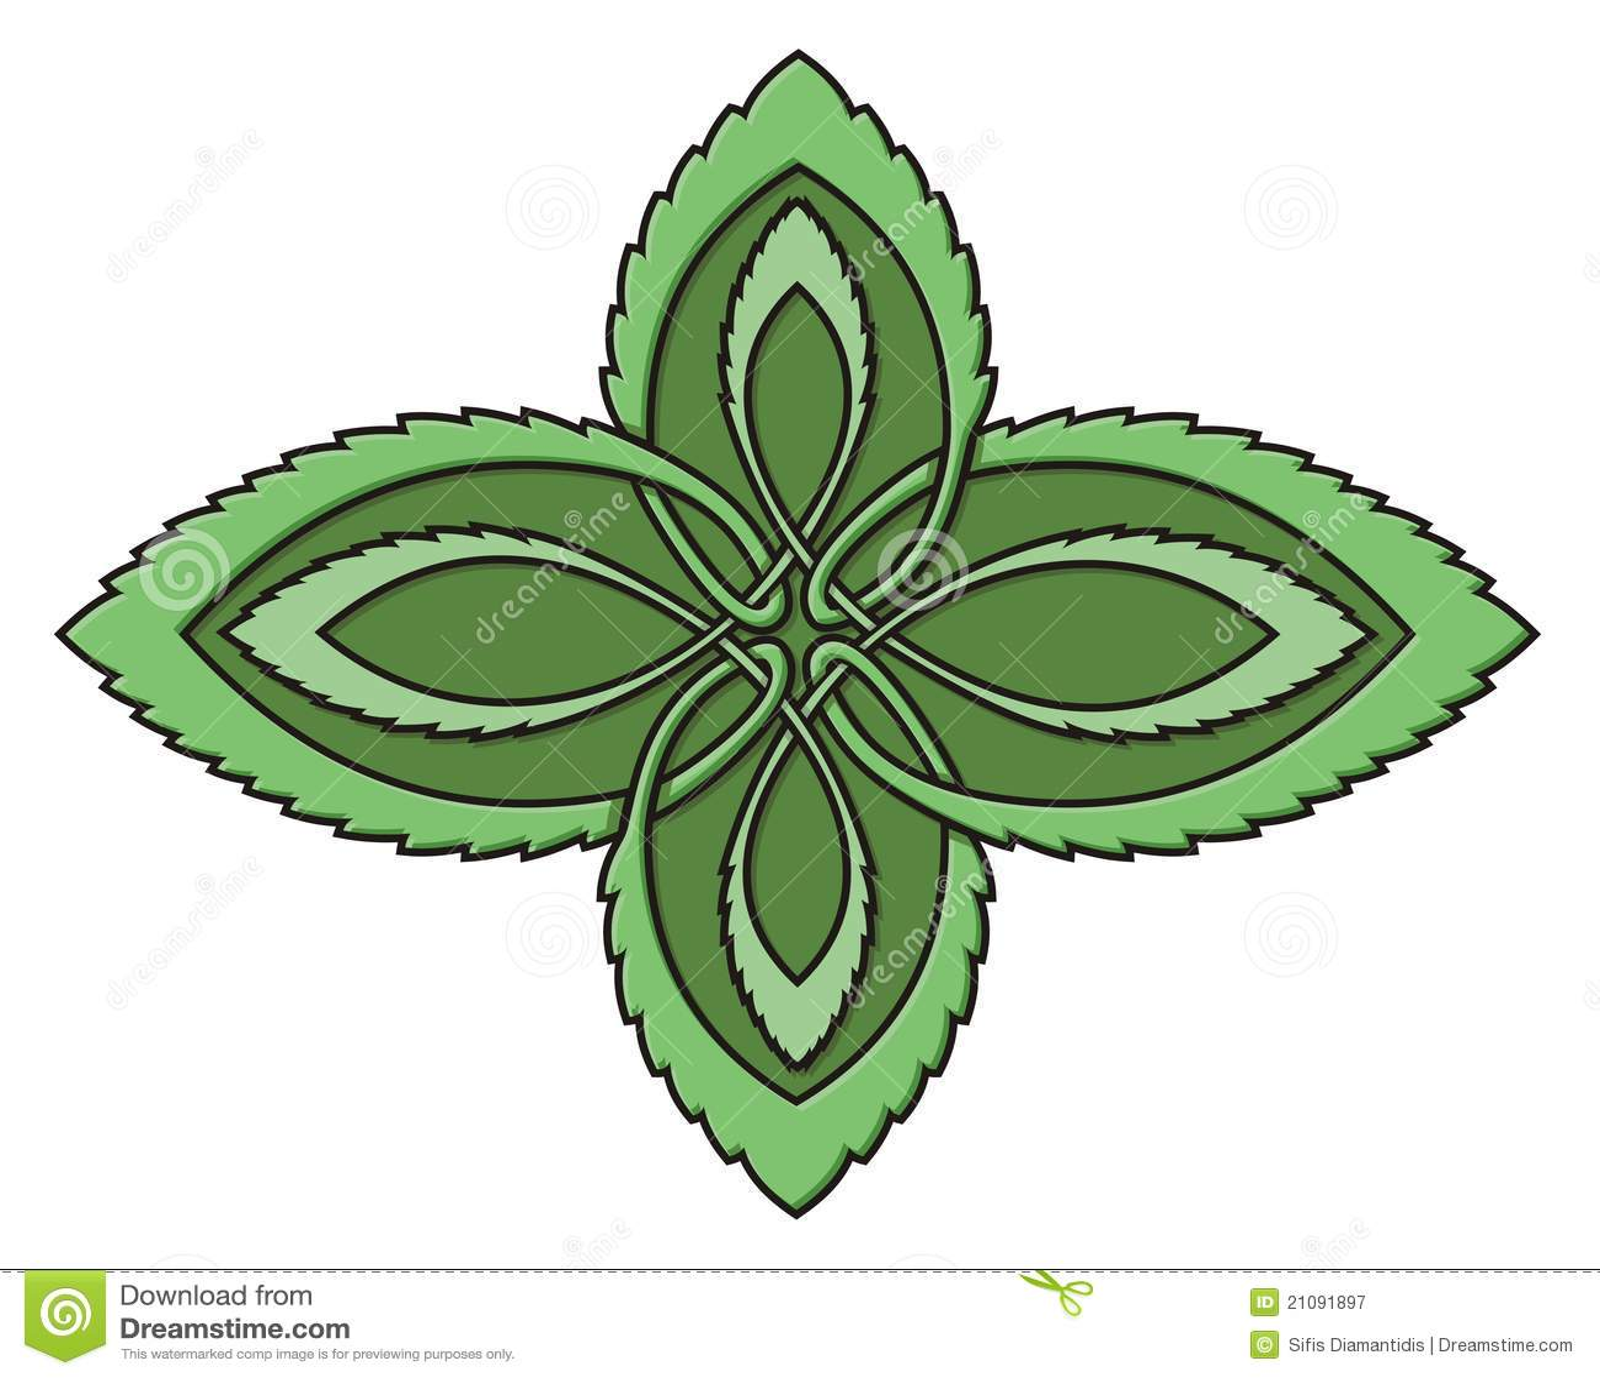 Mint celtic knot